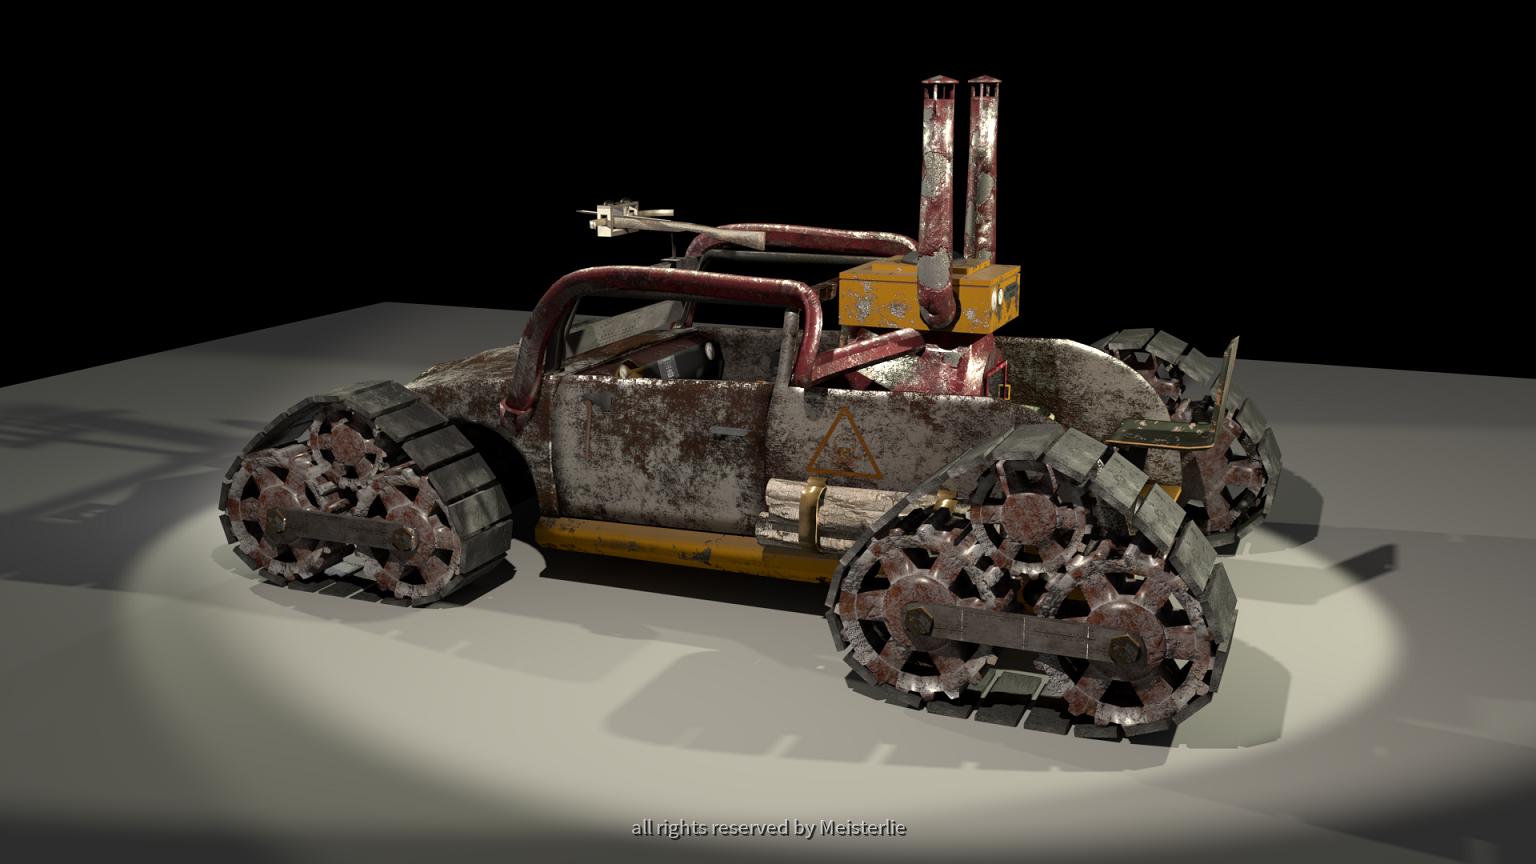 Selfmade Apocalyptic Car